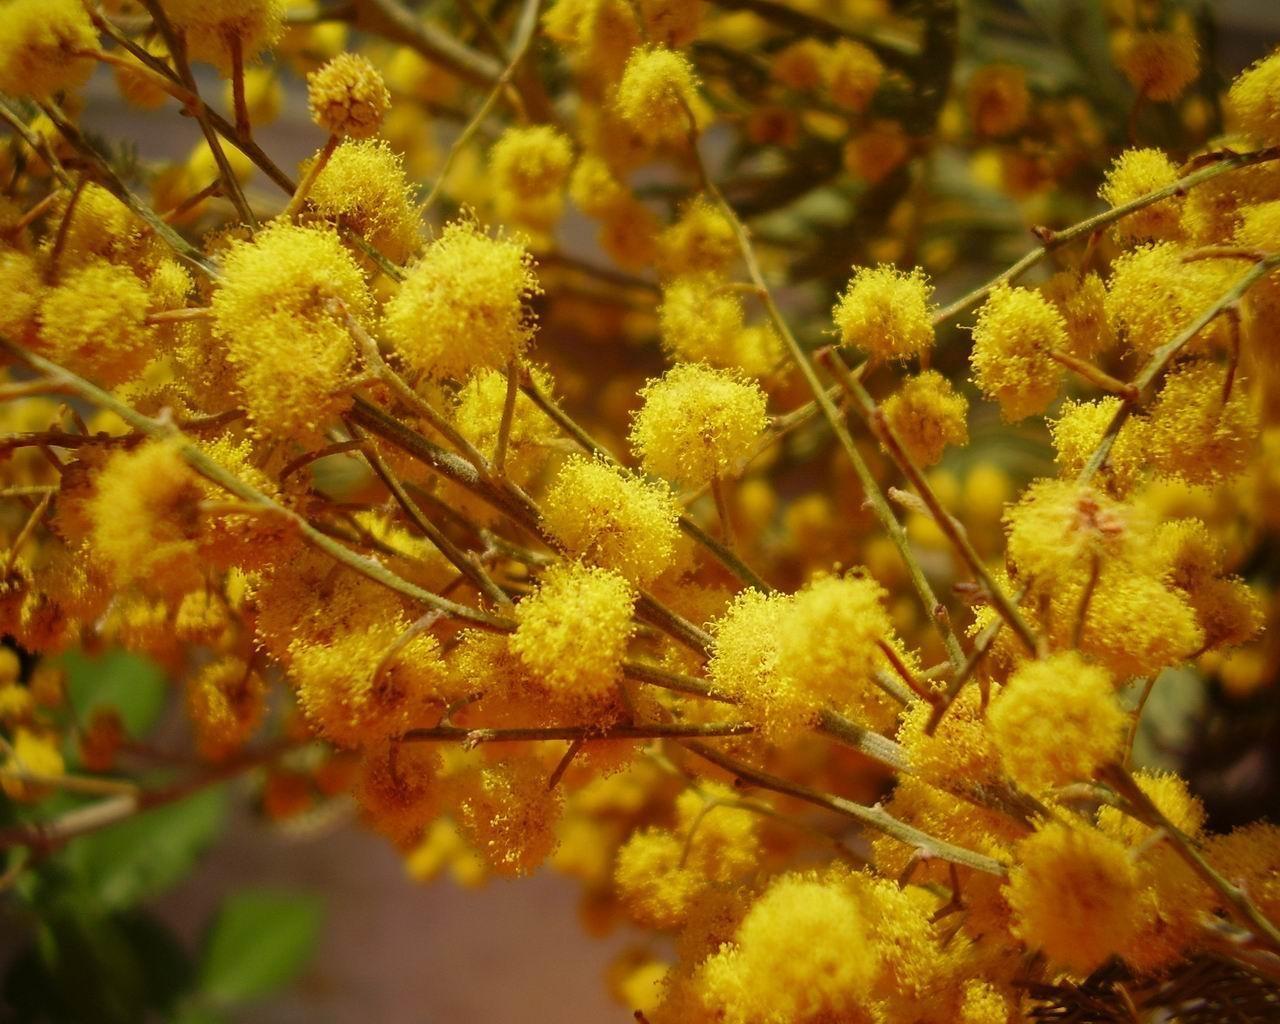 Мимоза обои (картинки, фото), желтая ...: wallspaper.ru/oboi/flowers/208-mimoza.html